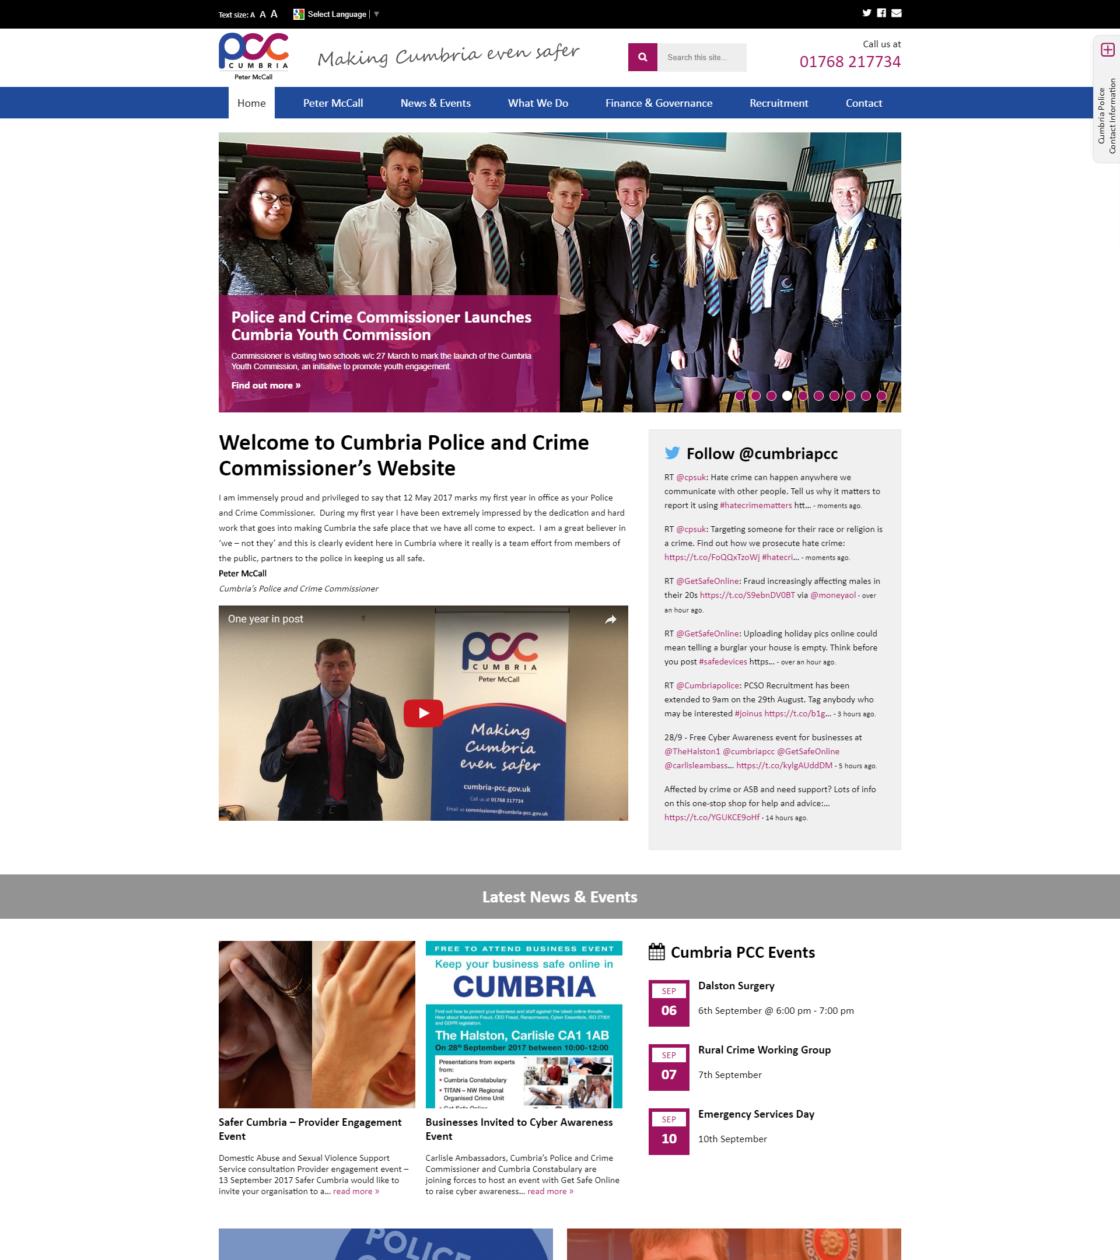 Cumbria Police & Crime Commissioner - Website | Formation Media